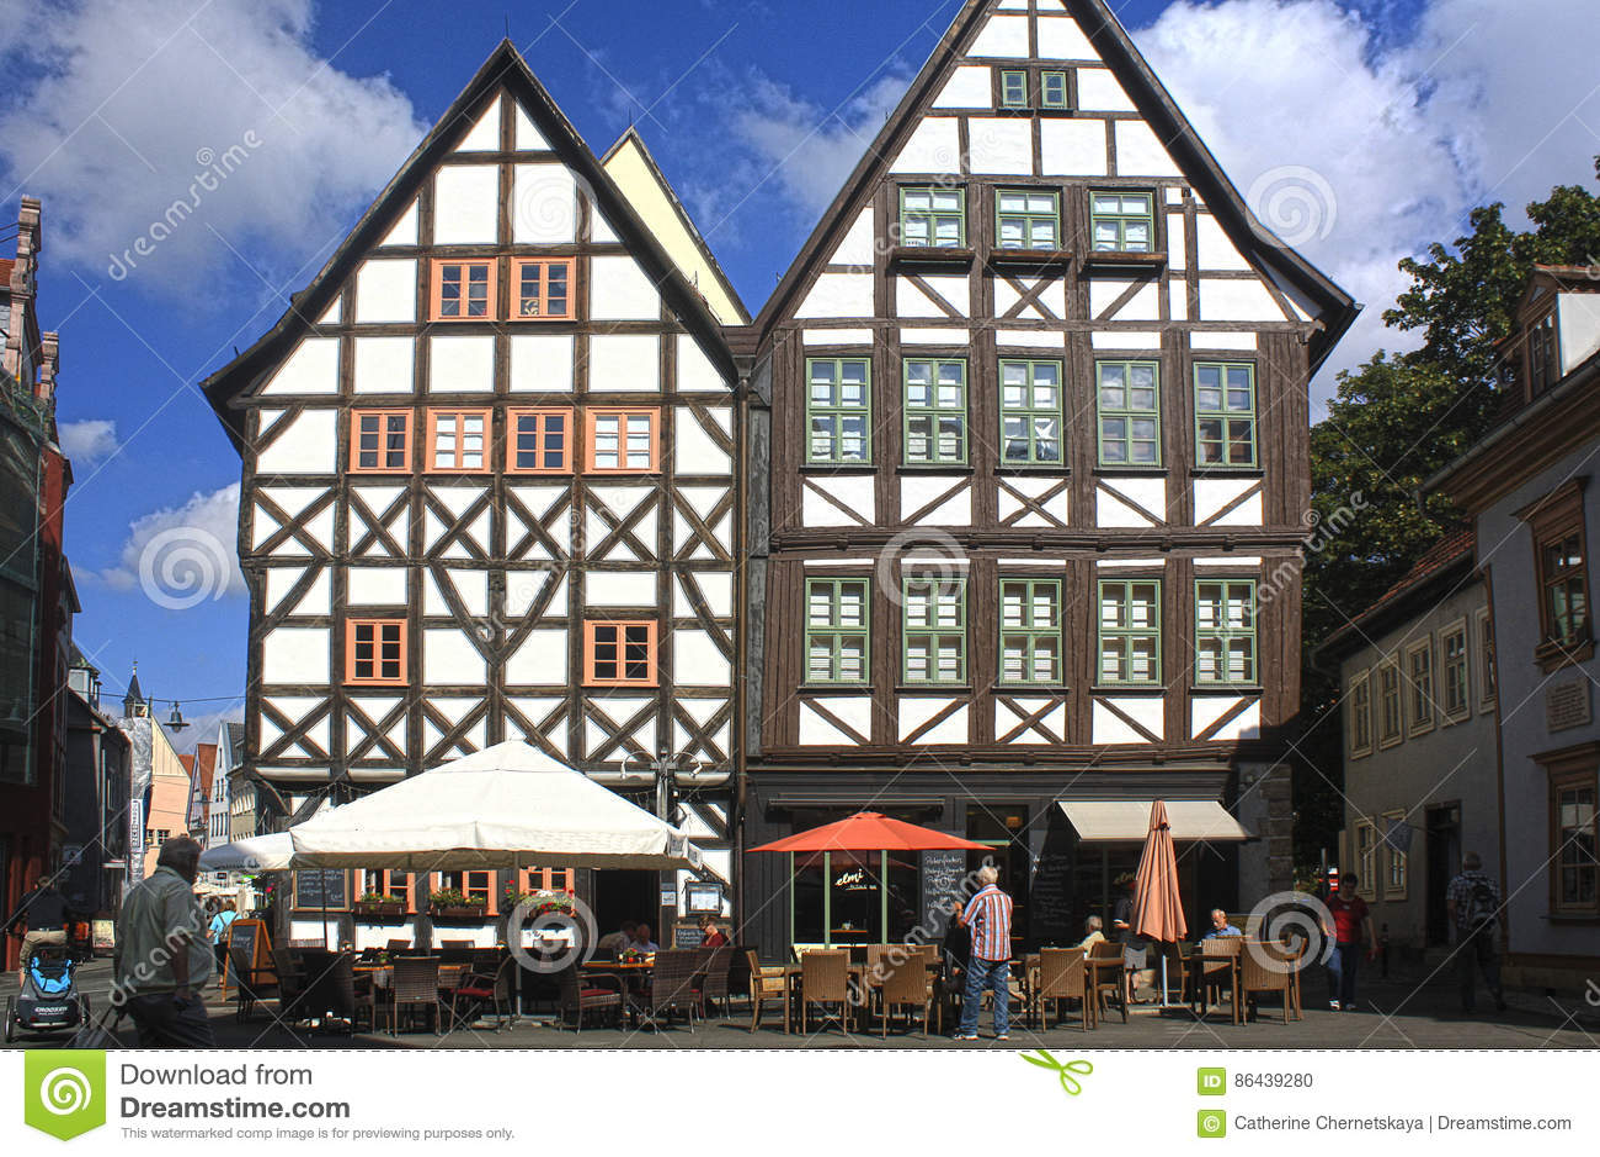 Fachwerk房子在埃福特,德国